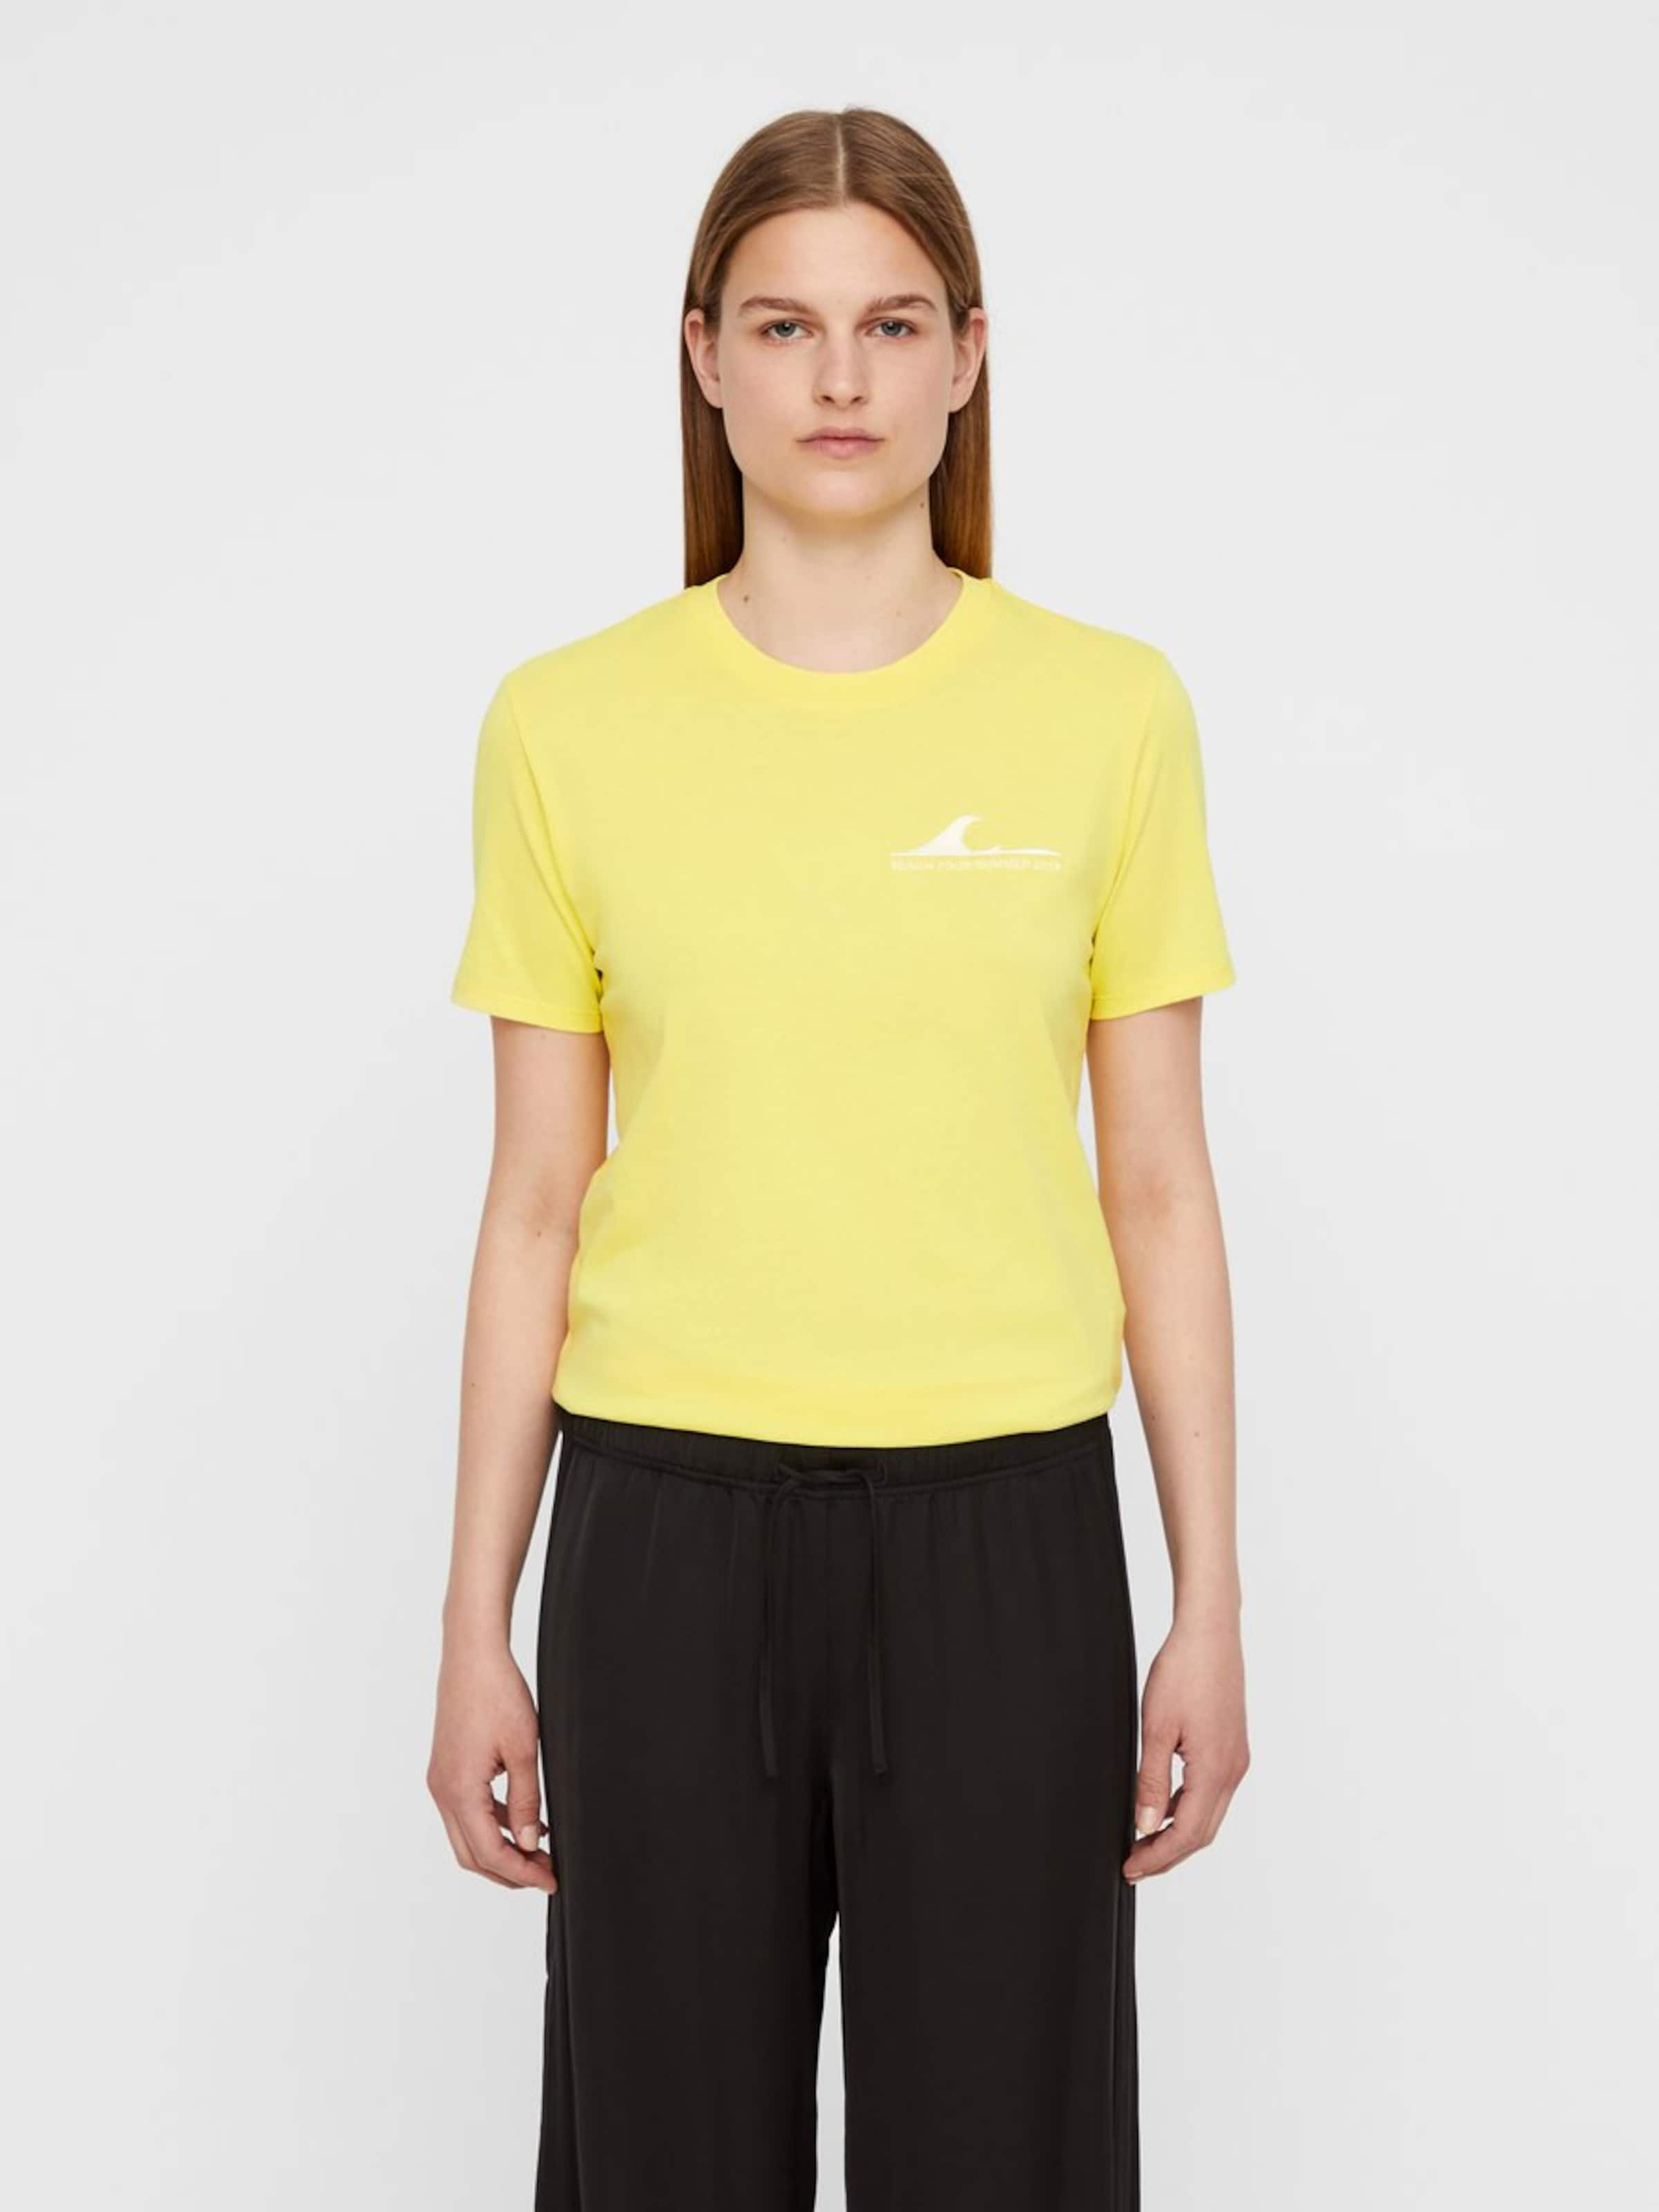 En Jaune Supima' T J 'monique shirt lindeberg g7vIYy6fb